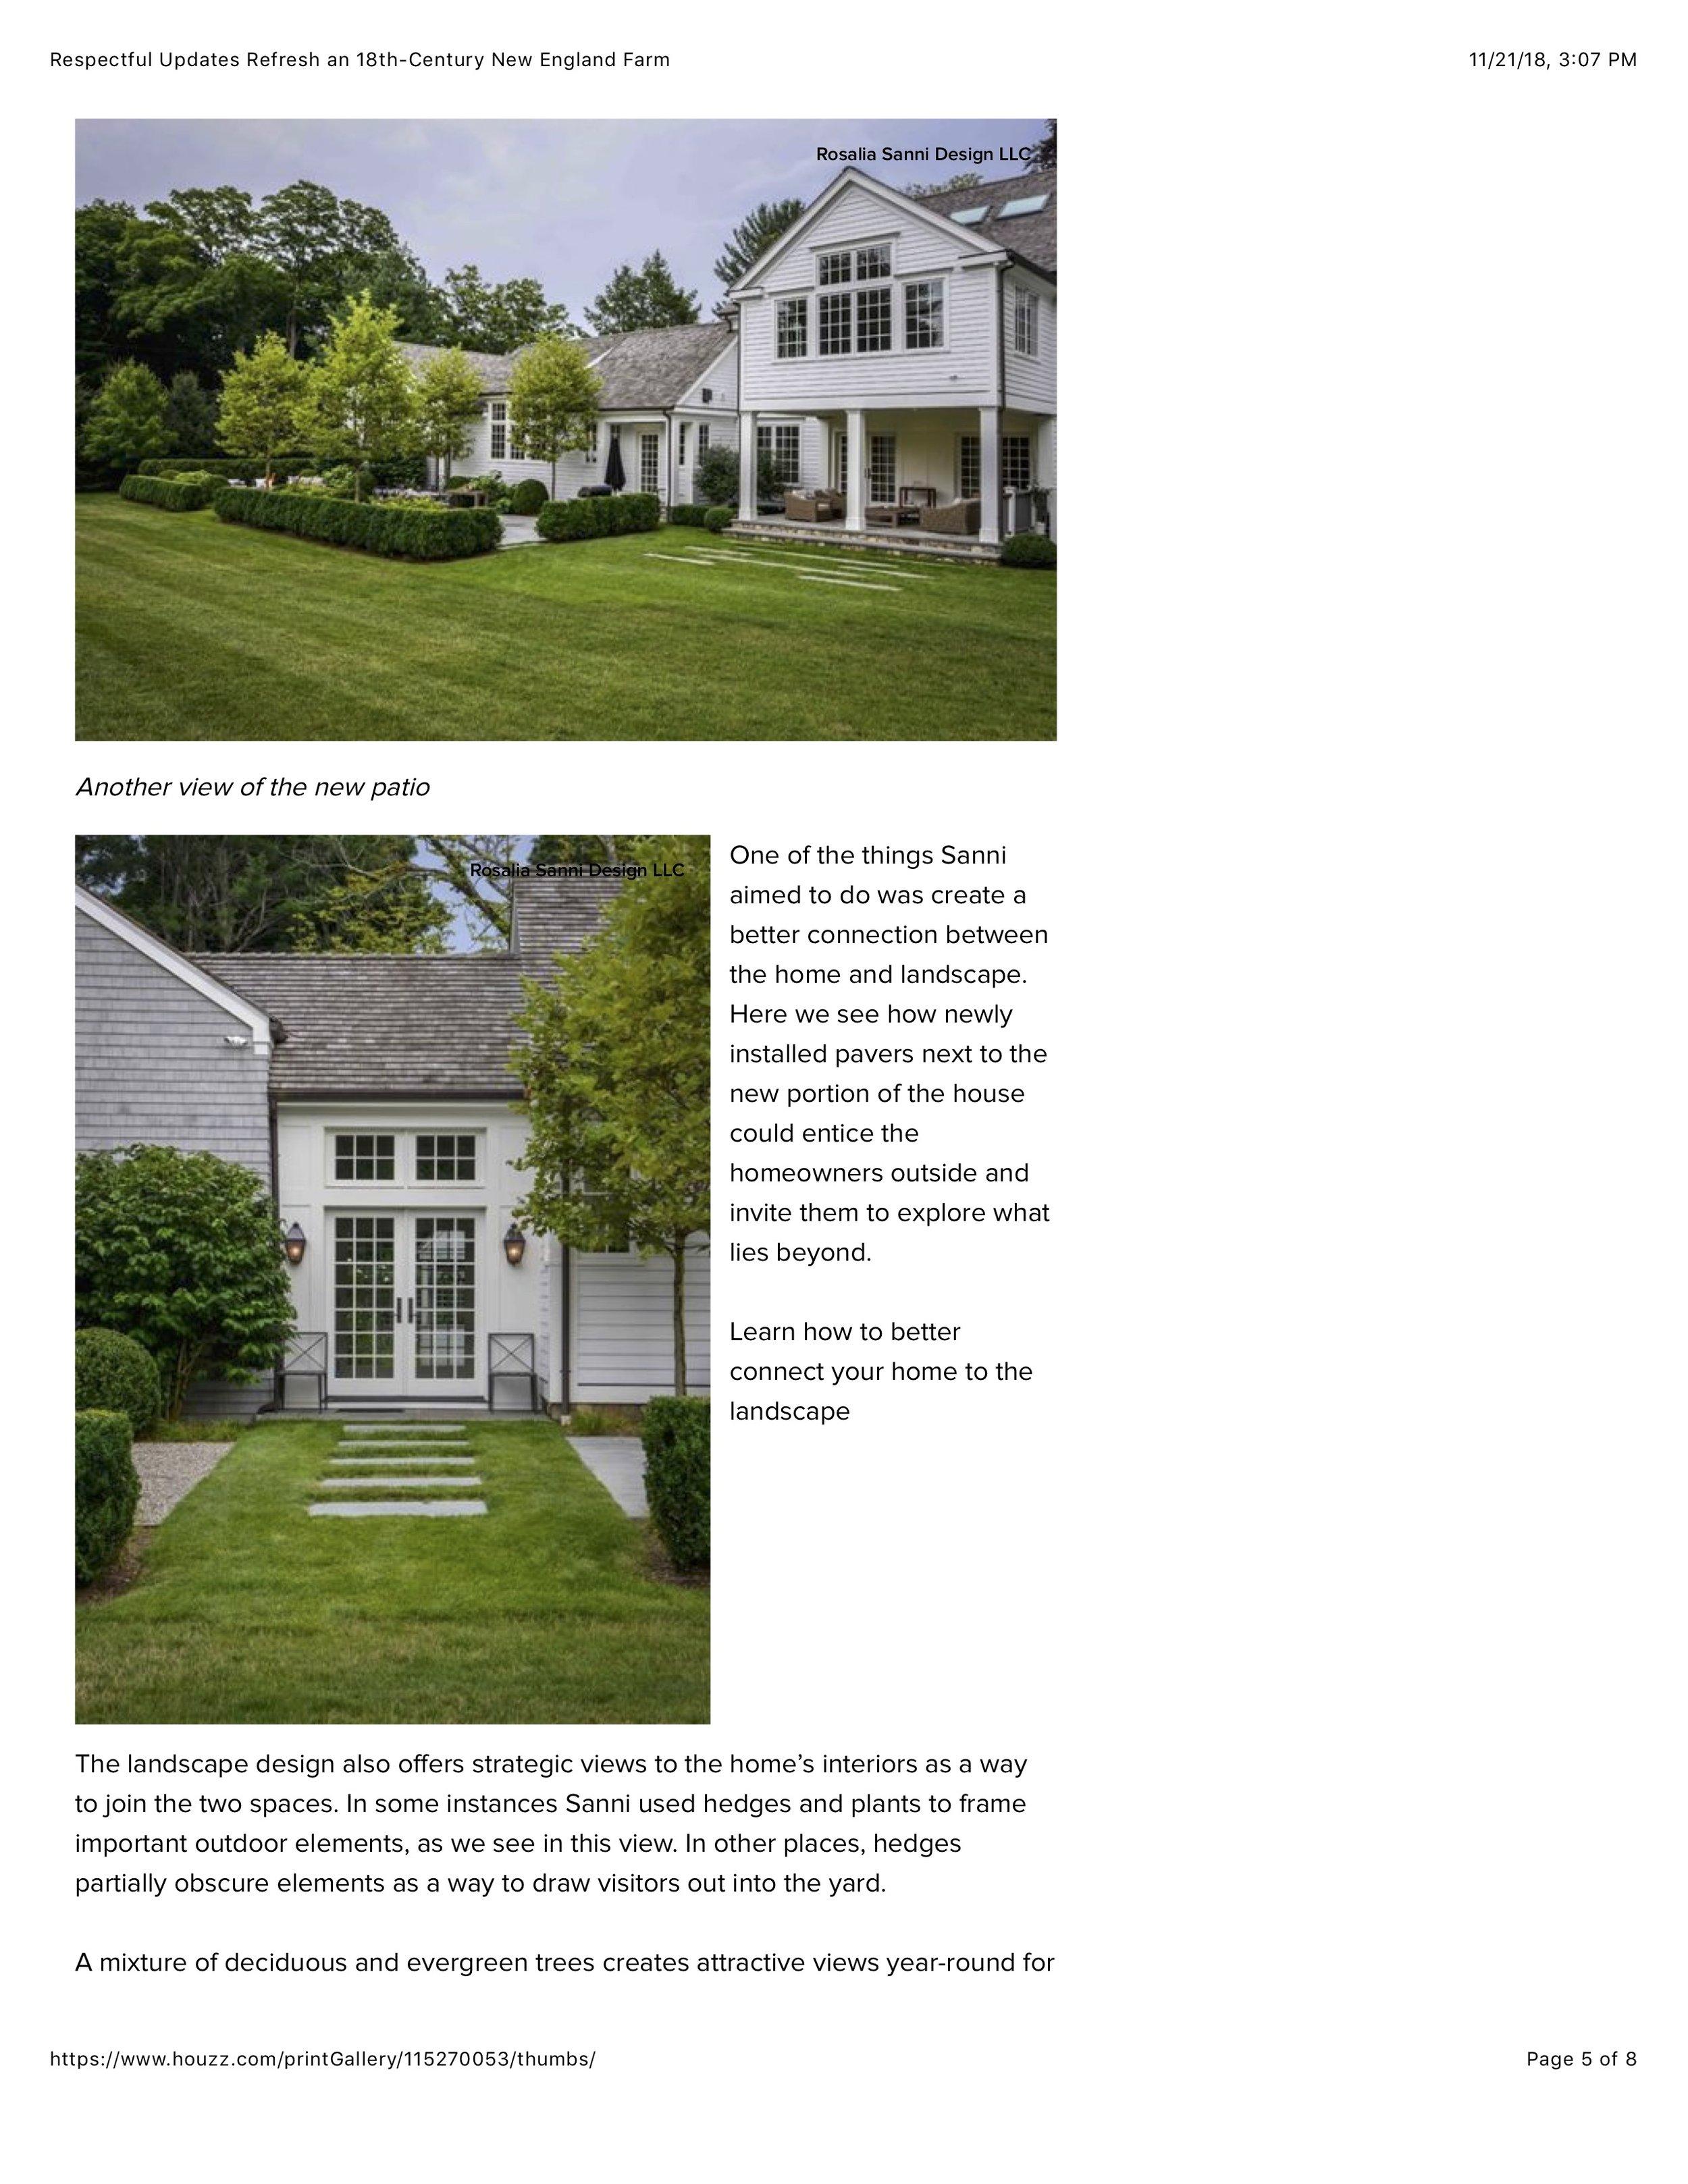 Respectful Updates Refresh an 18th-Century New England Farm 5.jpg